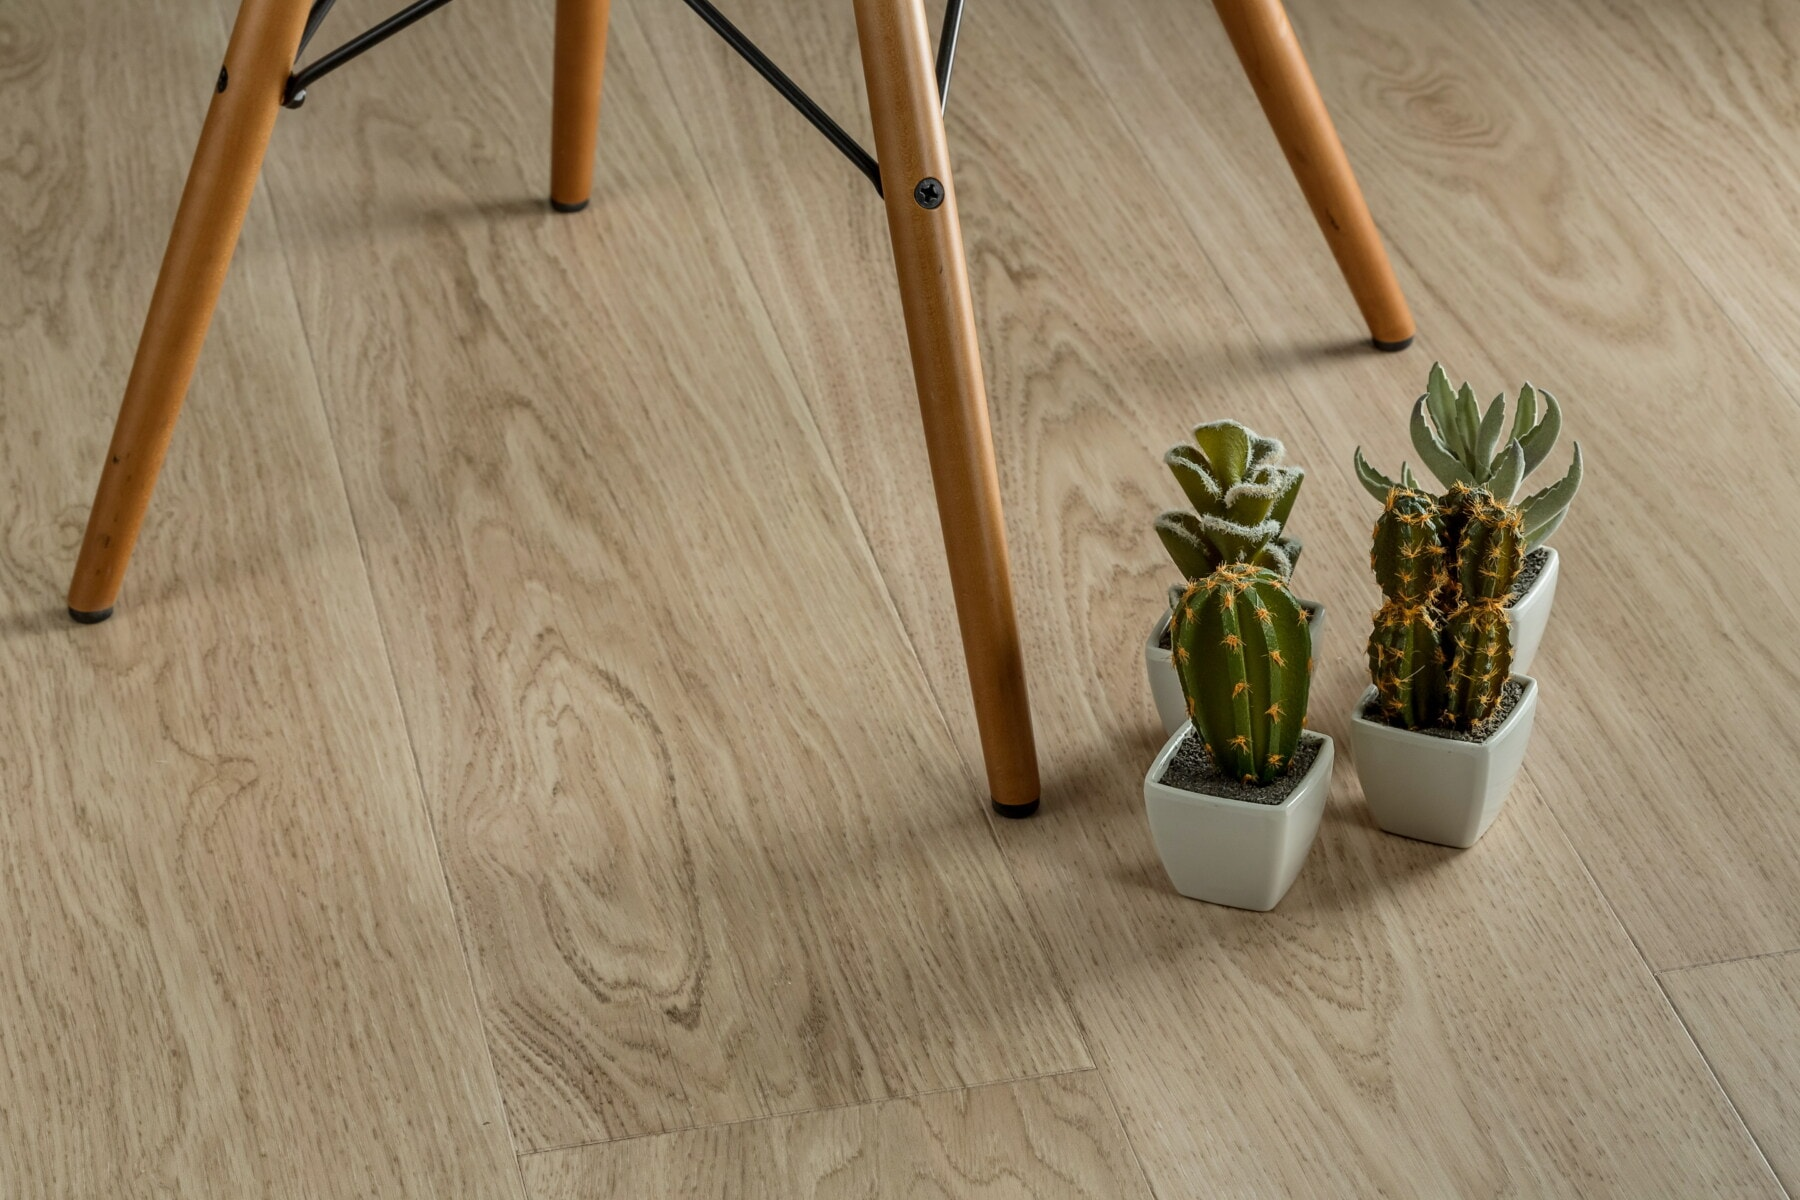 miniatyr, kaktus, blomsterpotte, minimalisme, stol, etasje, stil, parkett, tre, tre